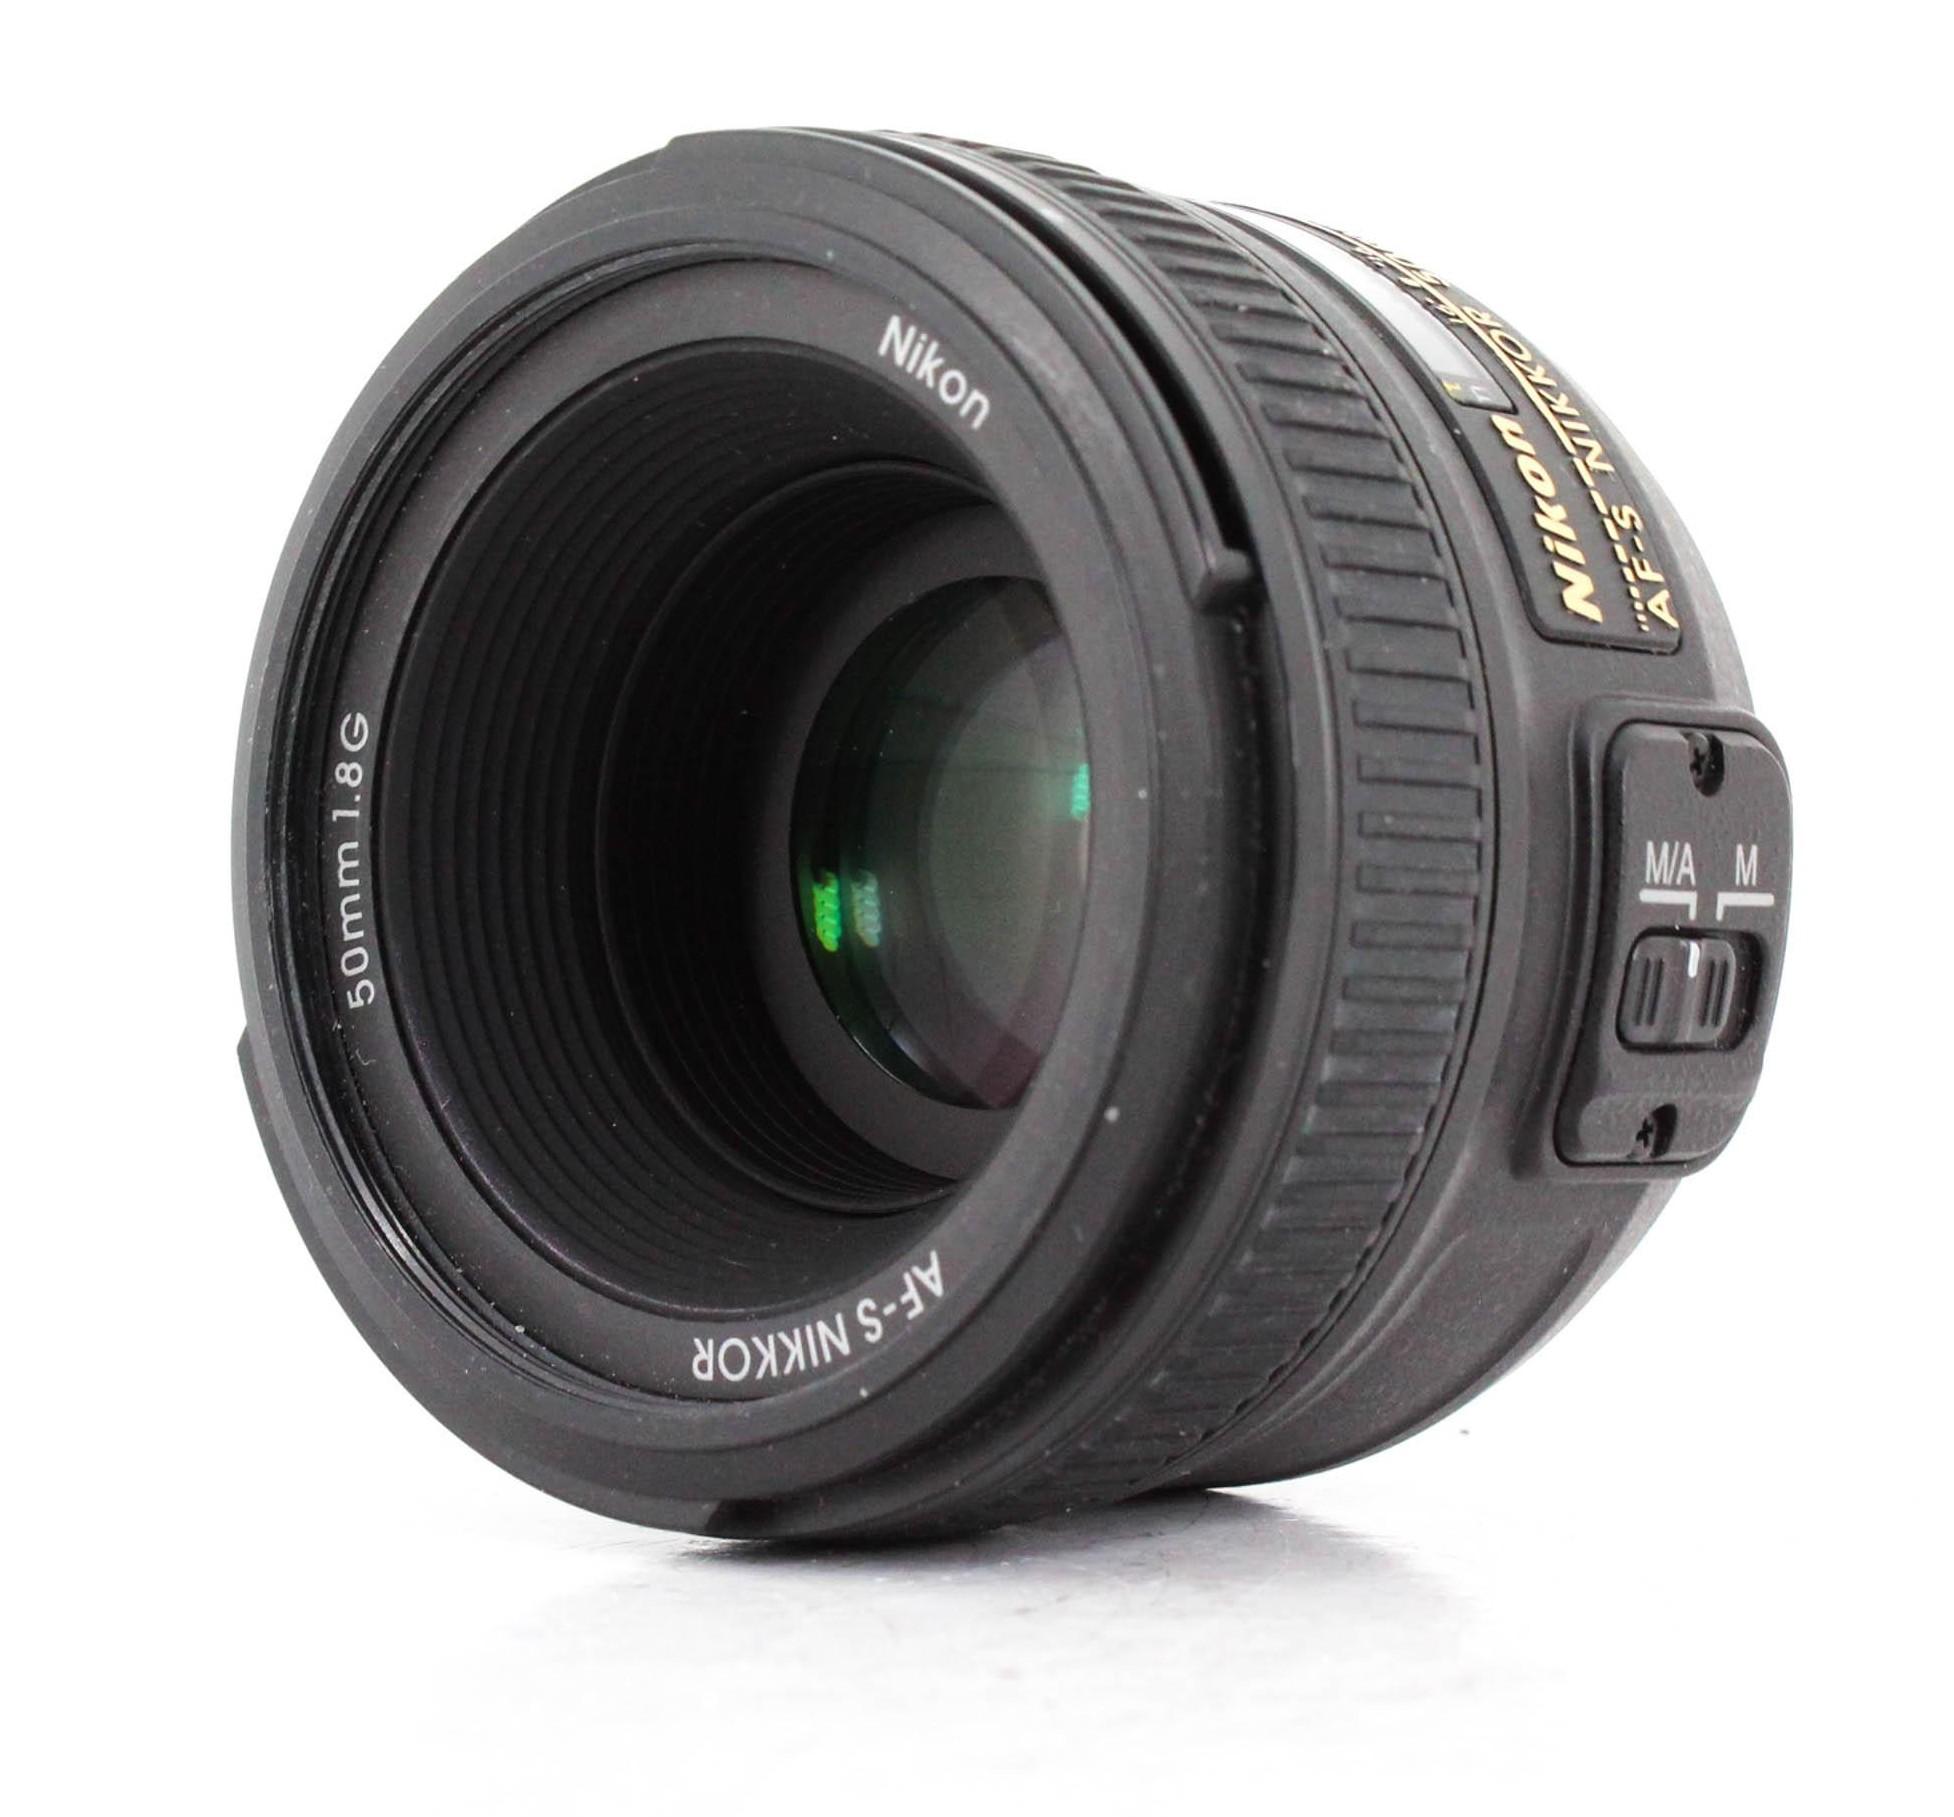 nikon 50mm f1.8g image